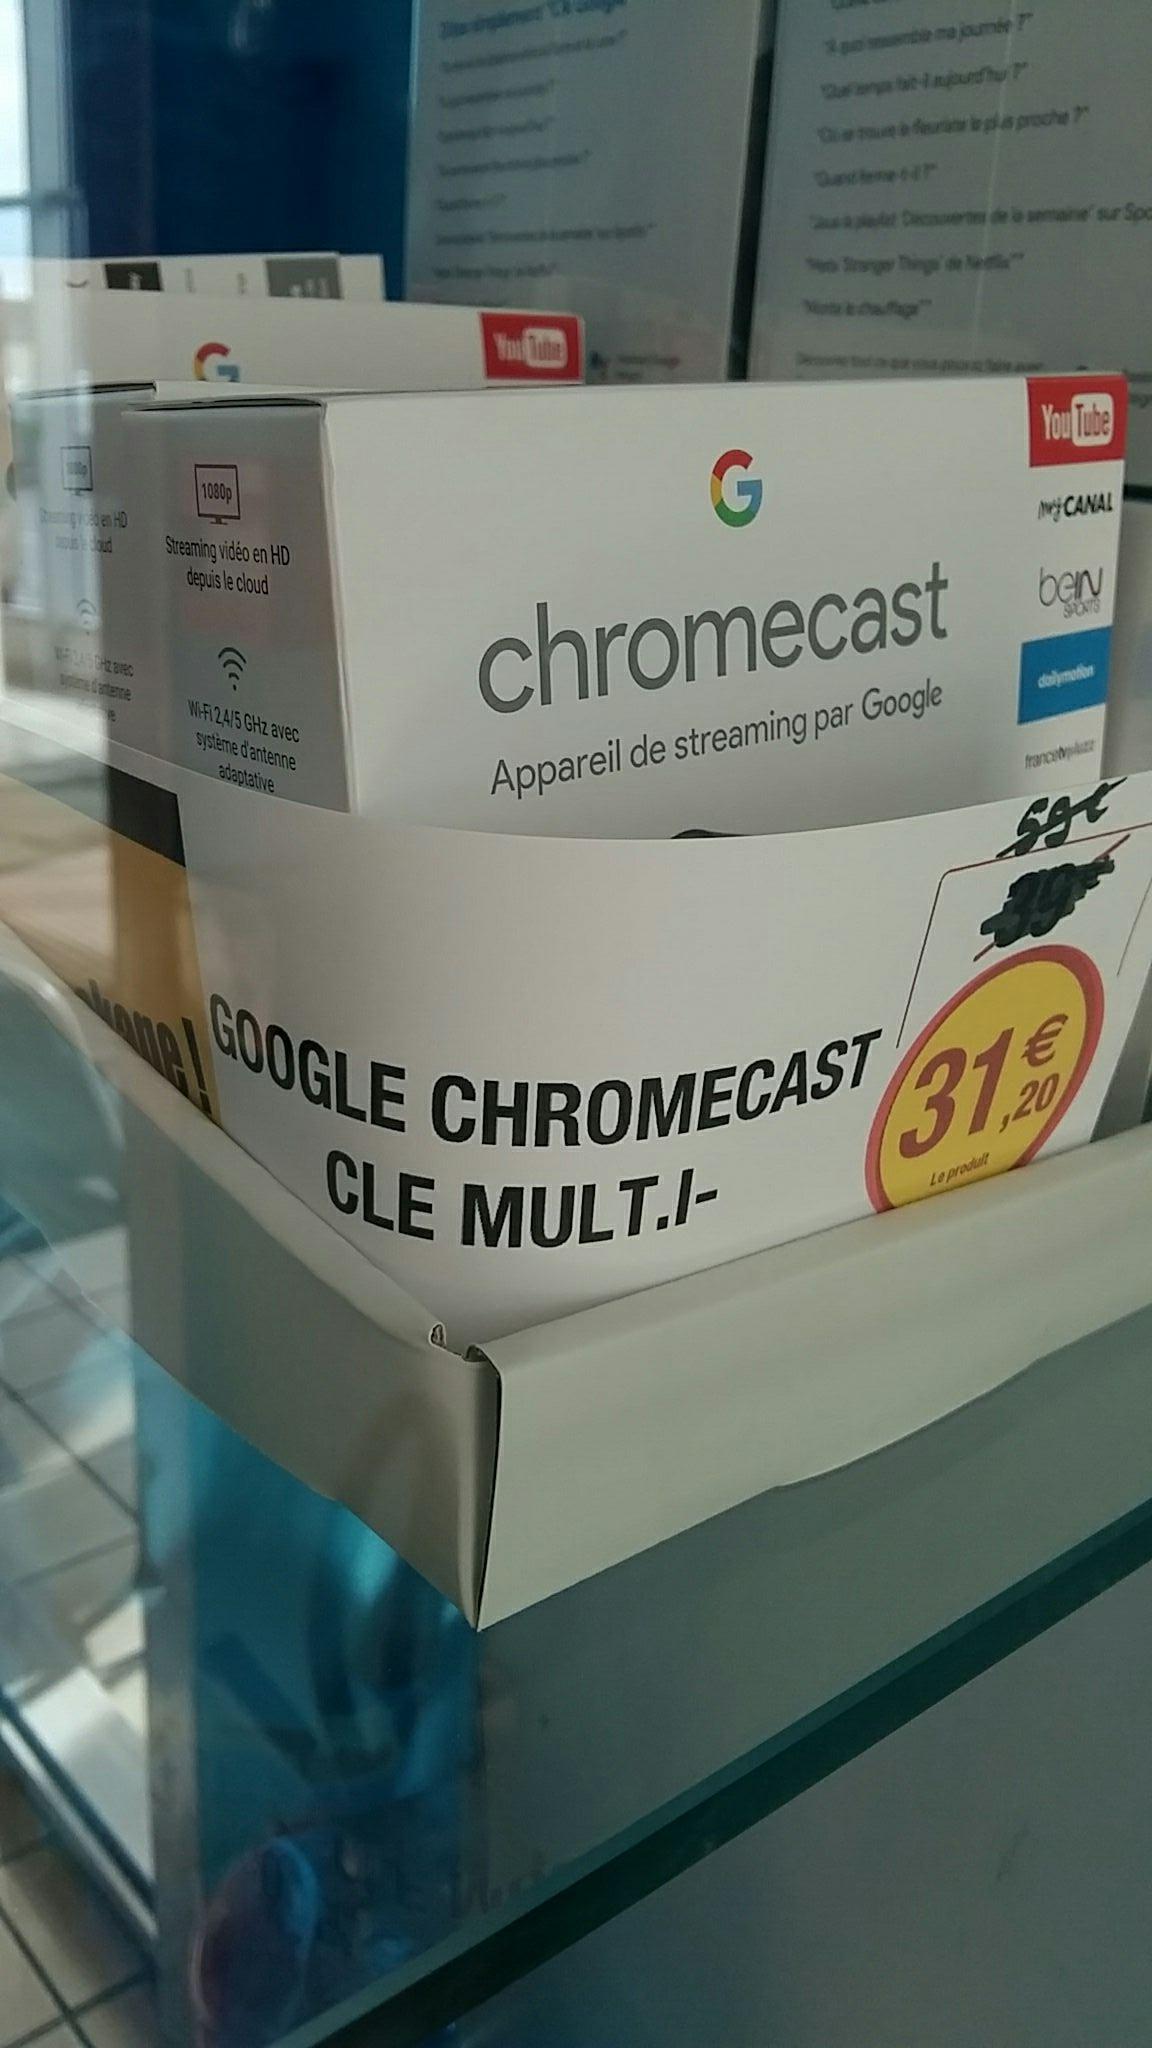 Clé HDMI Google ChromeCast - Super U Bruxerolles (86)